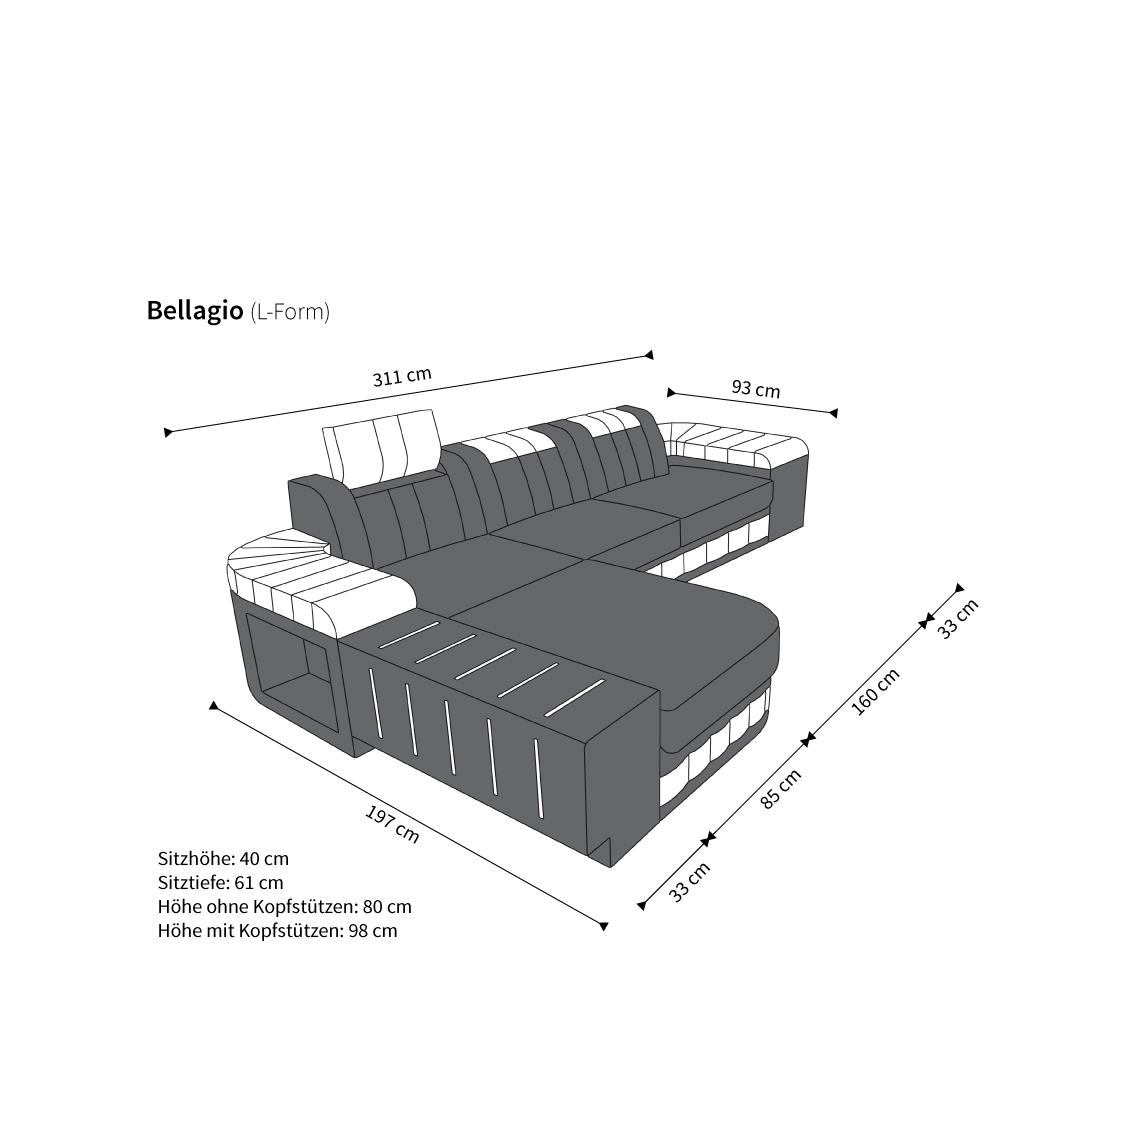 Design stoff sofa bellagio l form schwarzgrau kaufen bei for Designer ecksofas stoff